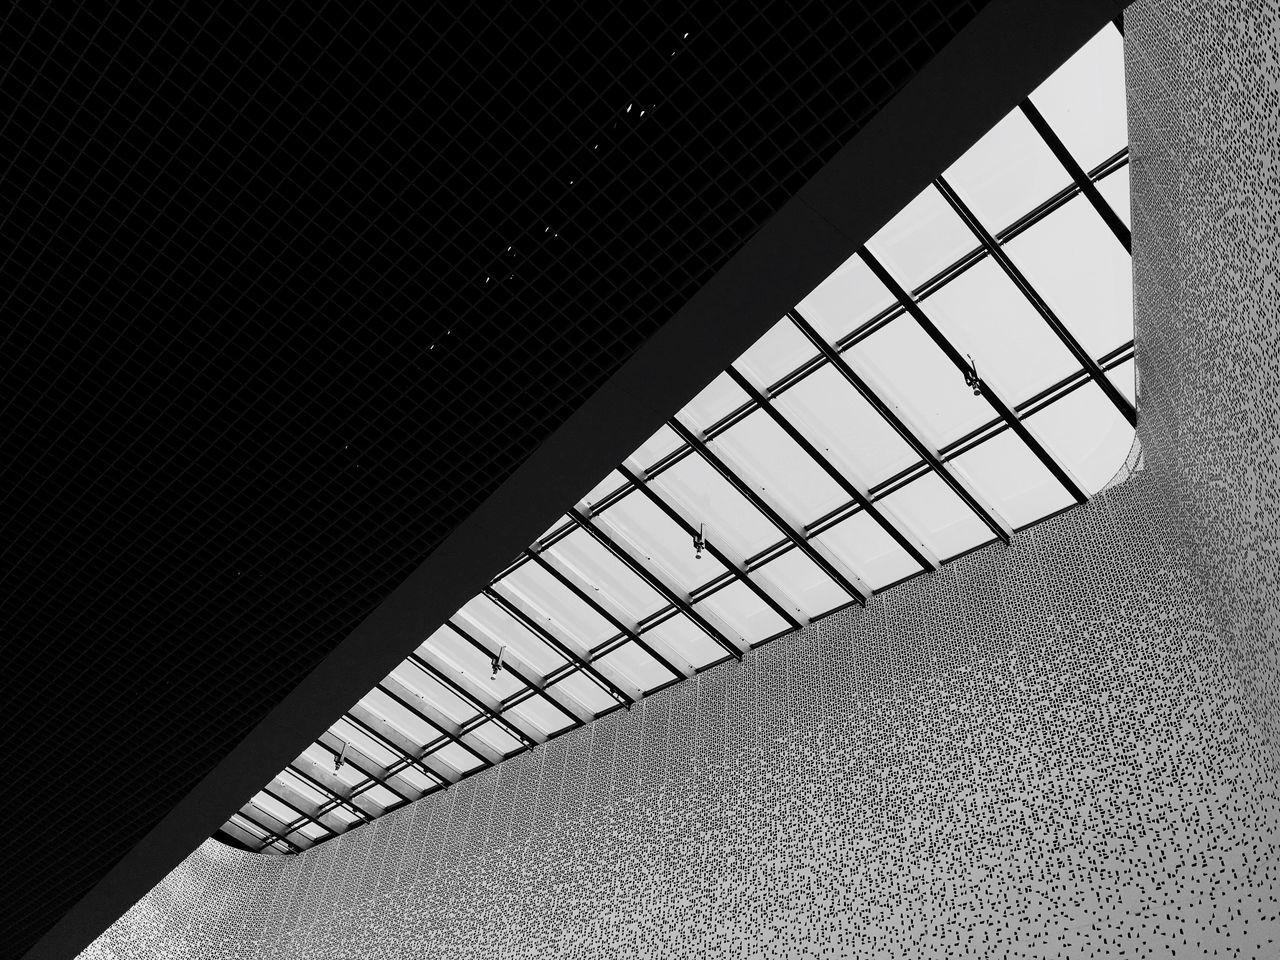 EyeEm Best Shots Architecture Monochrome B&w Pivotal Ideas